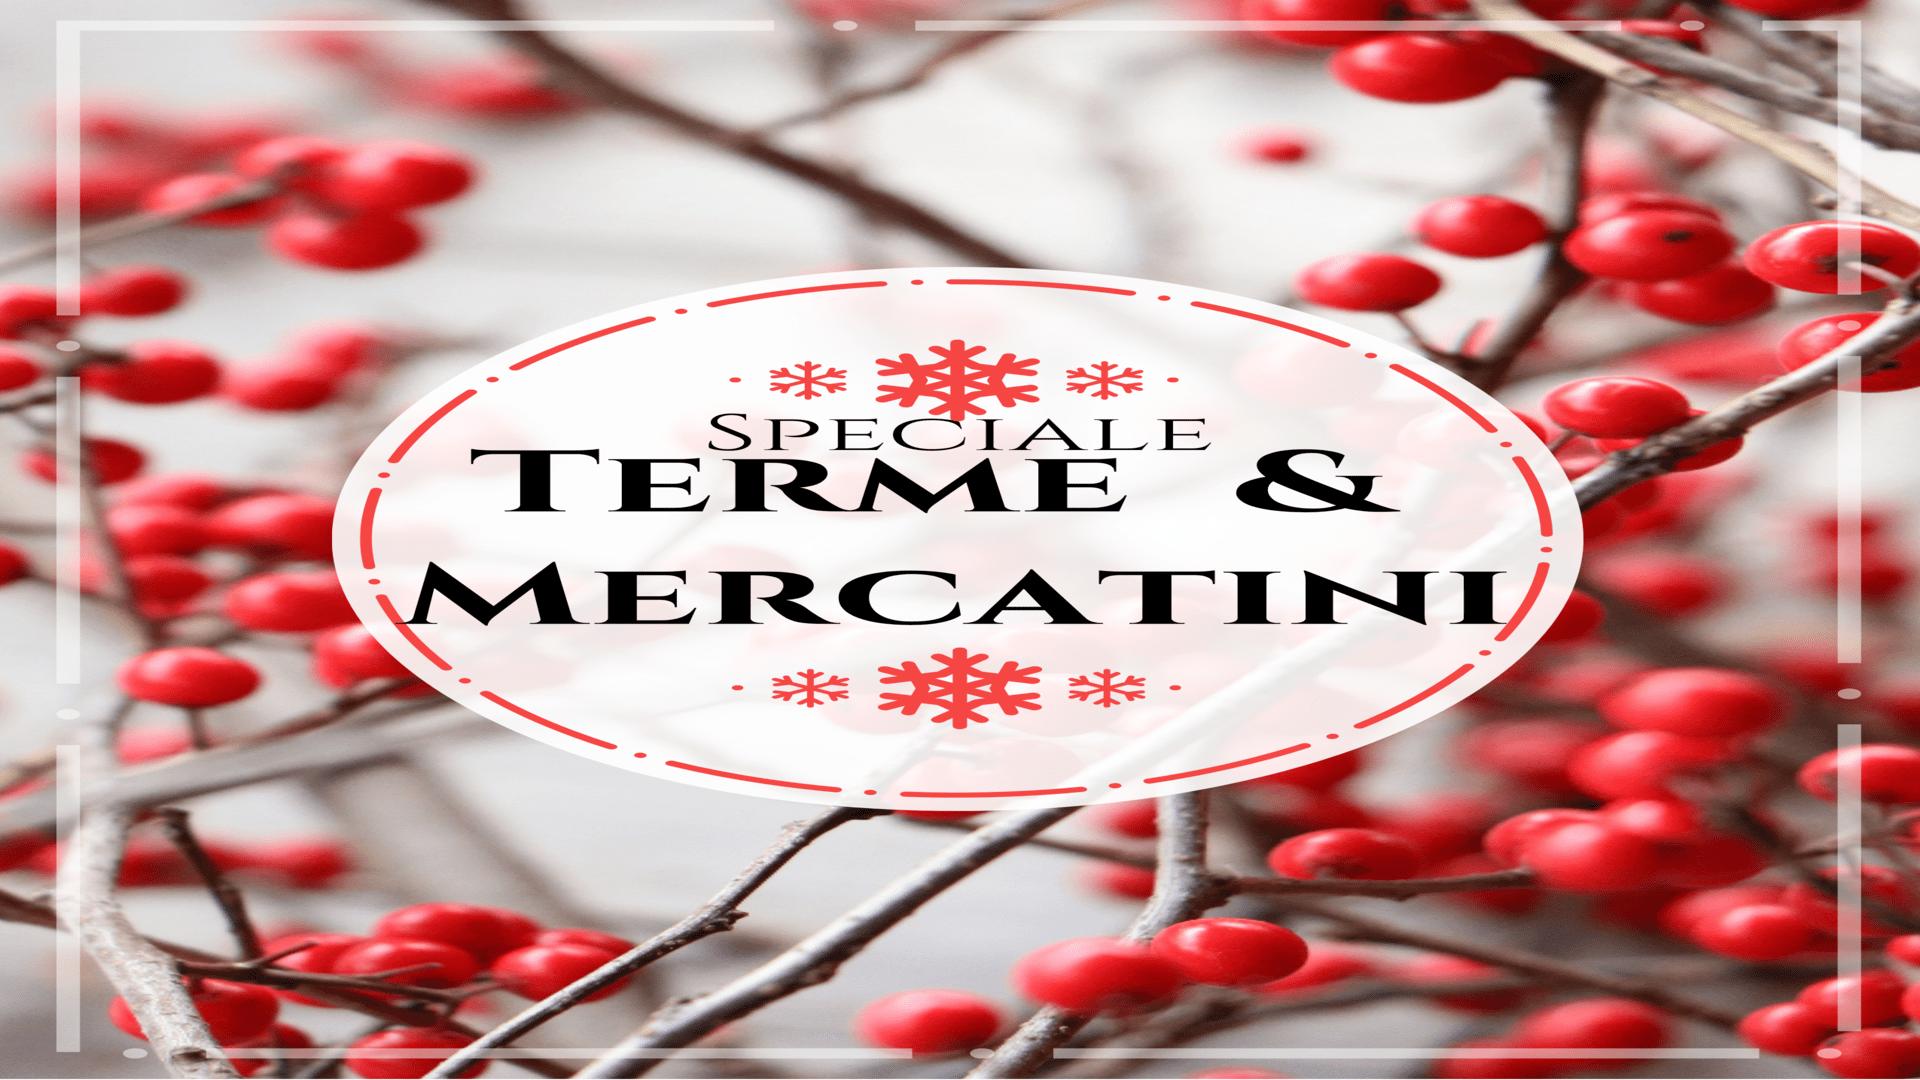 Speciale Terme e Mercatini